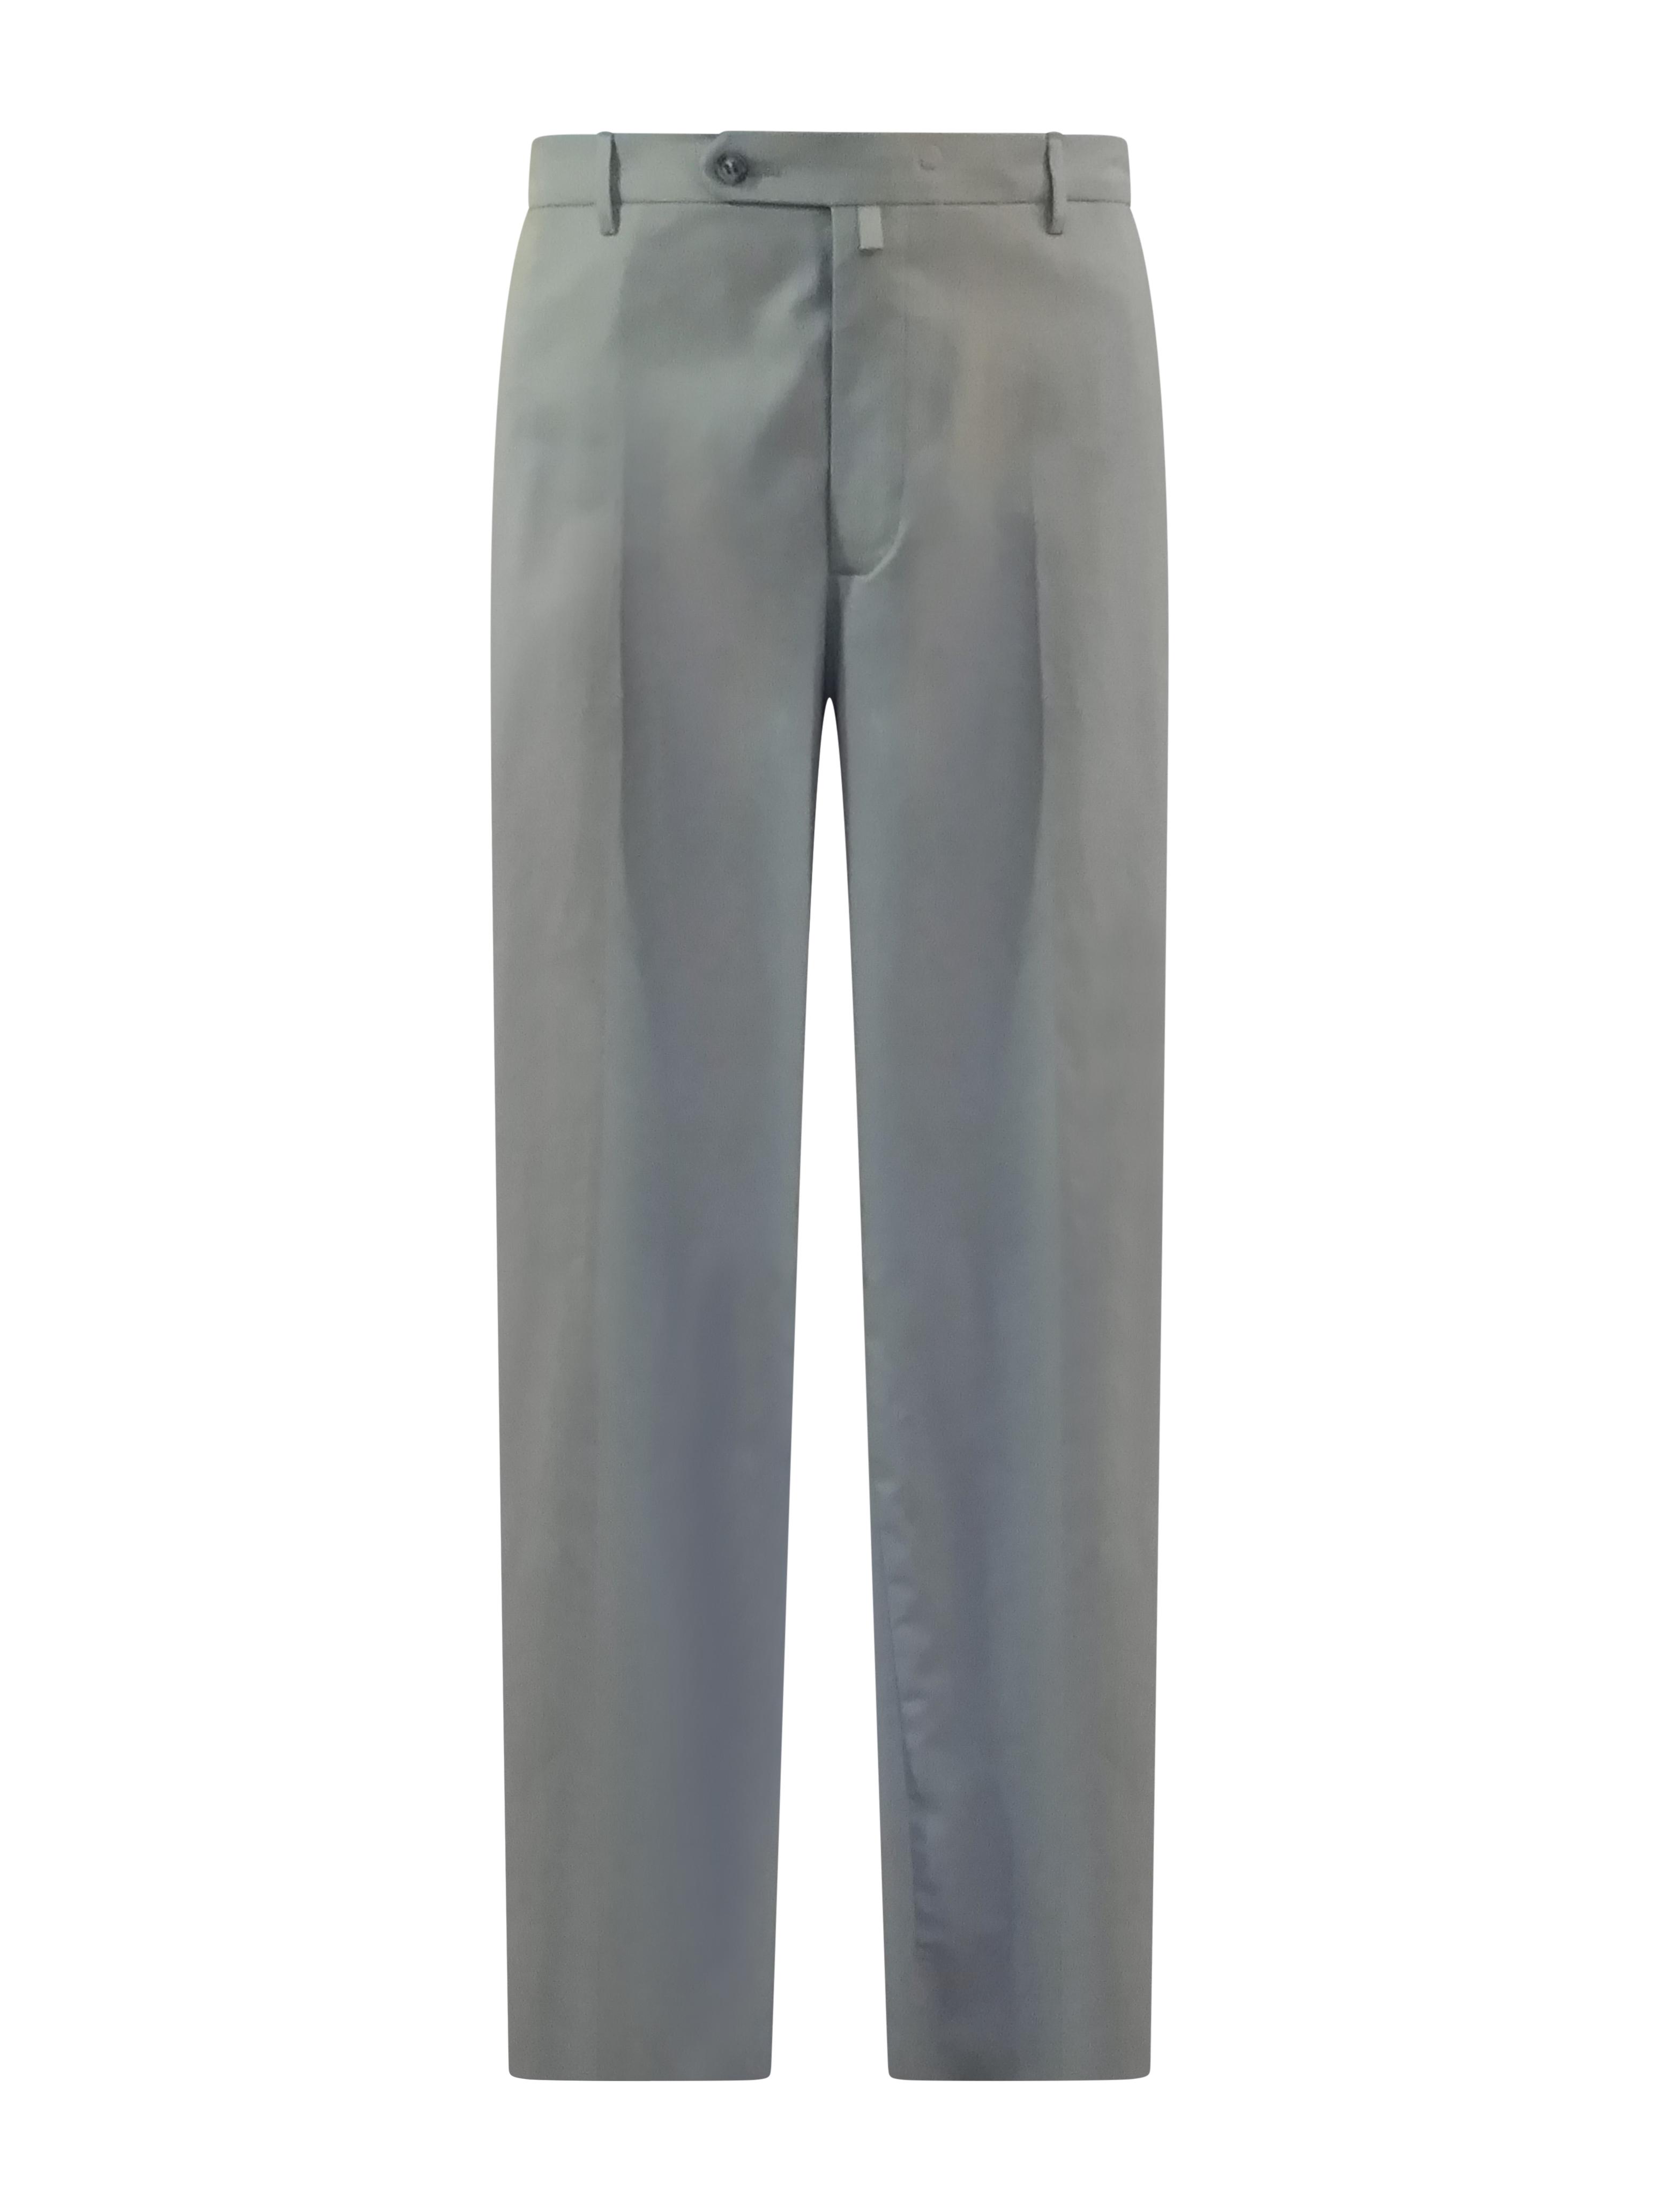 bespoke made pants